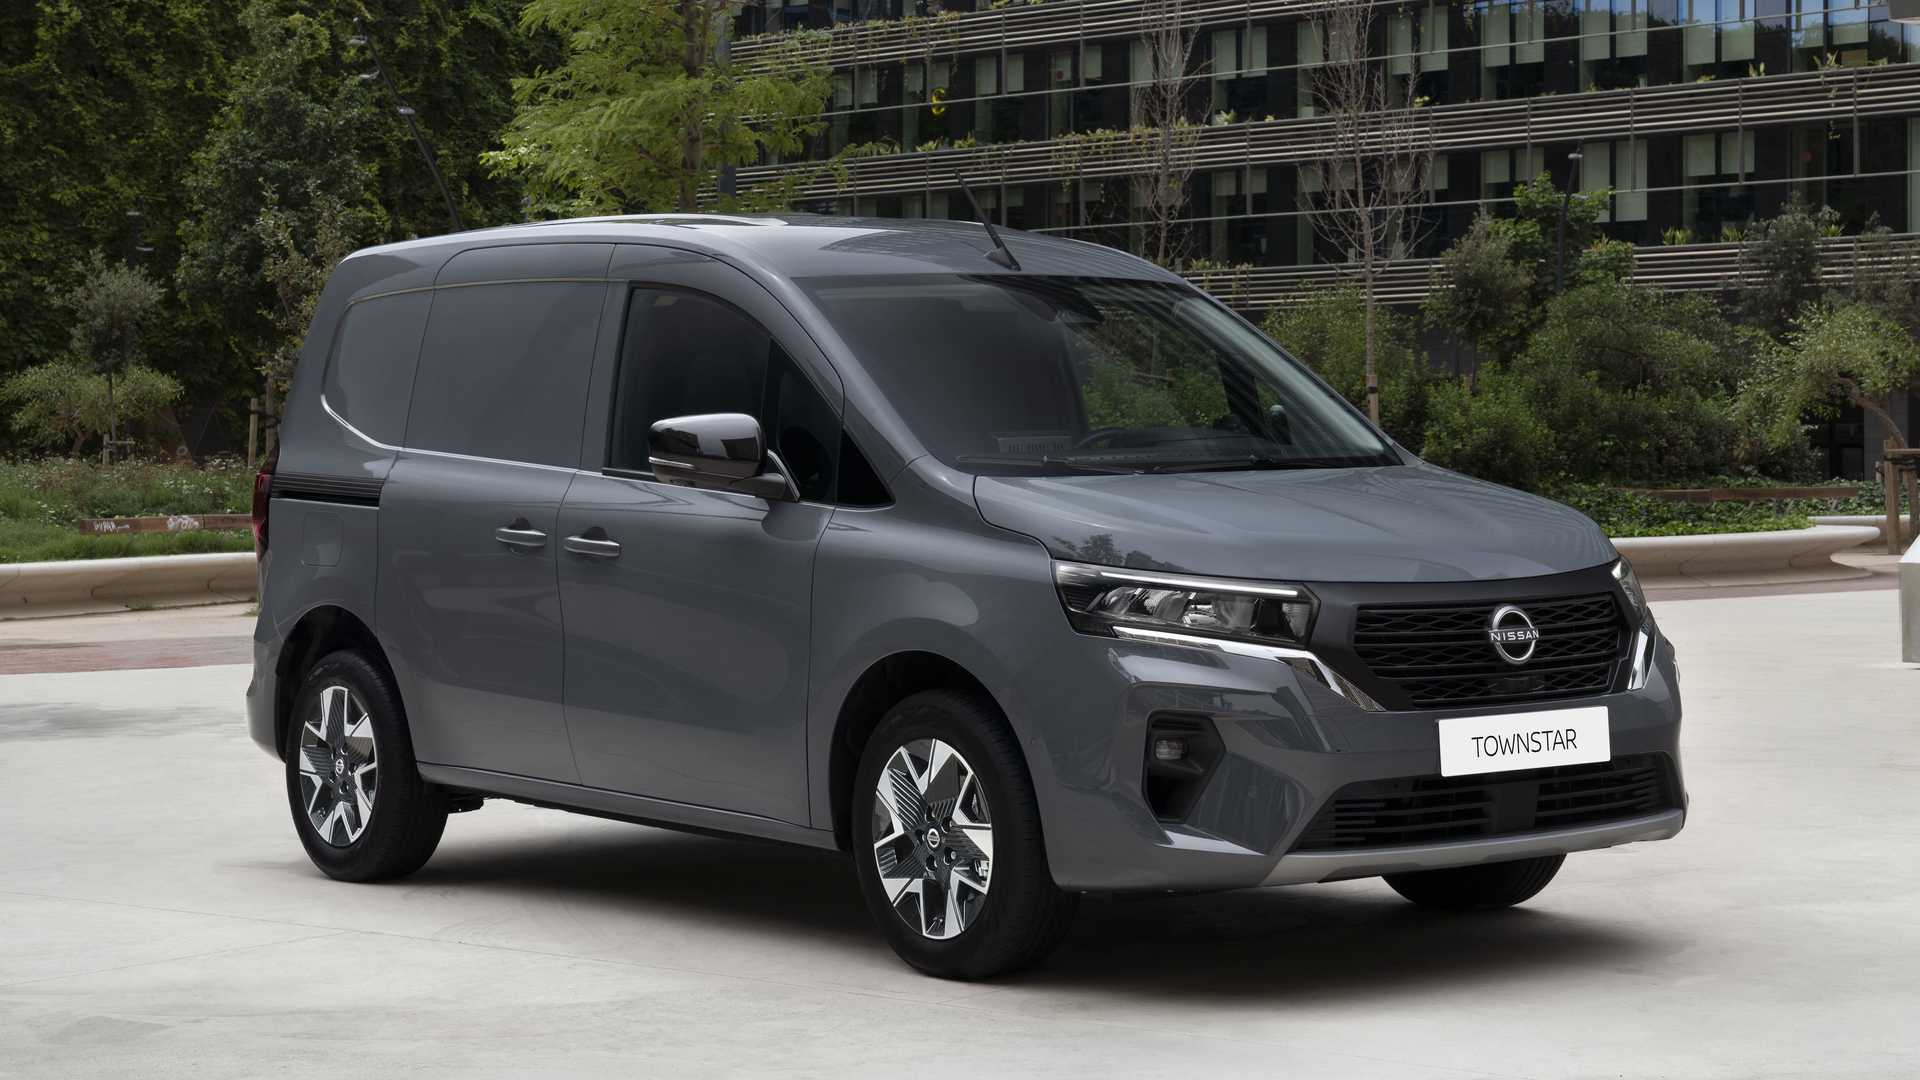 Nissan Townstar 2022